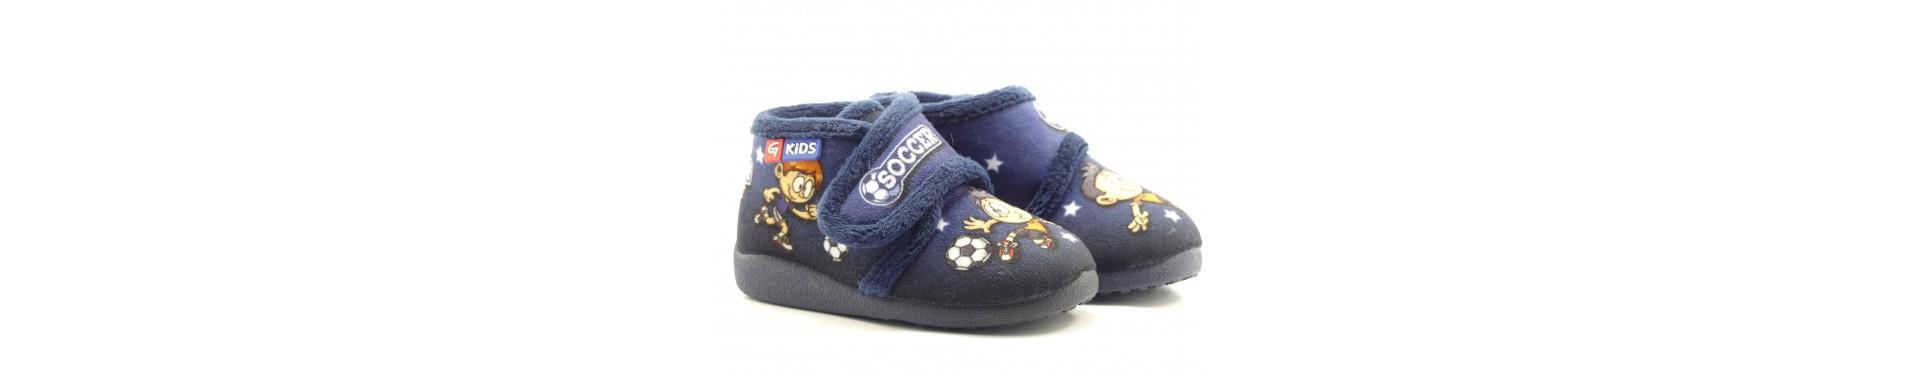 Zapatillas Estar Por Casa Niño Comprar | Chapo